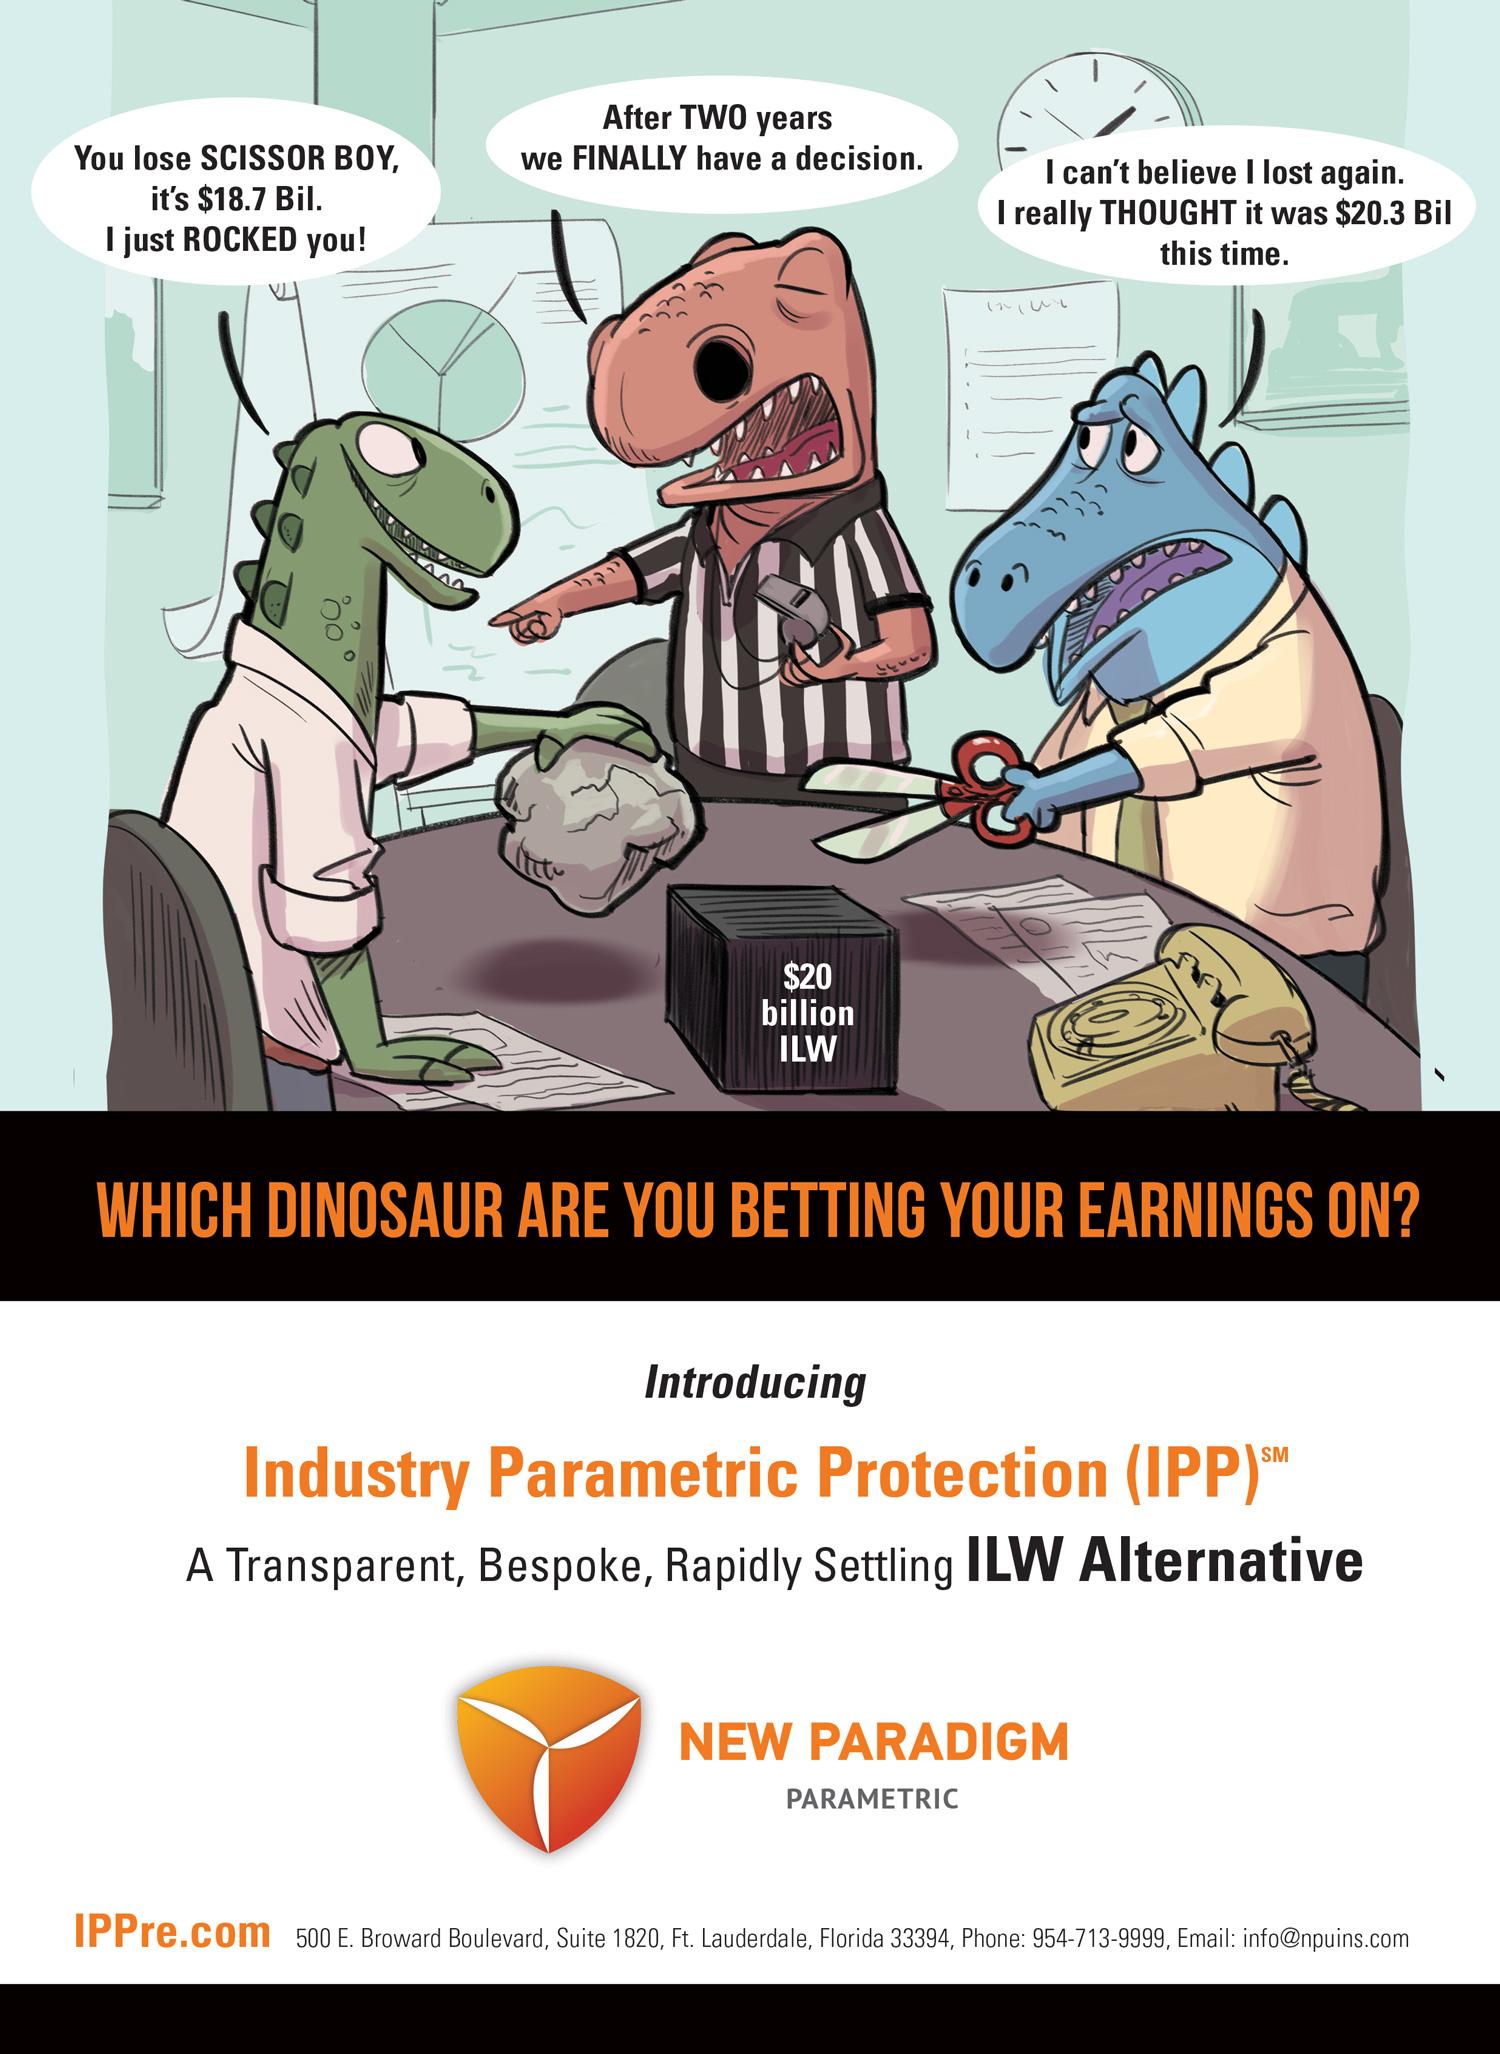 Understanding New Paradigm Parametric Underwriters